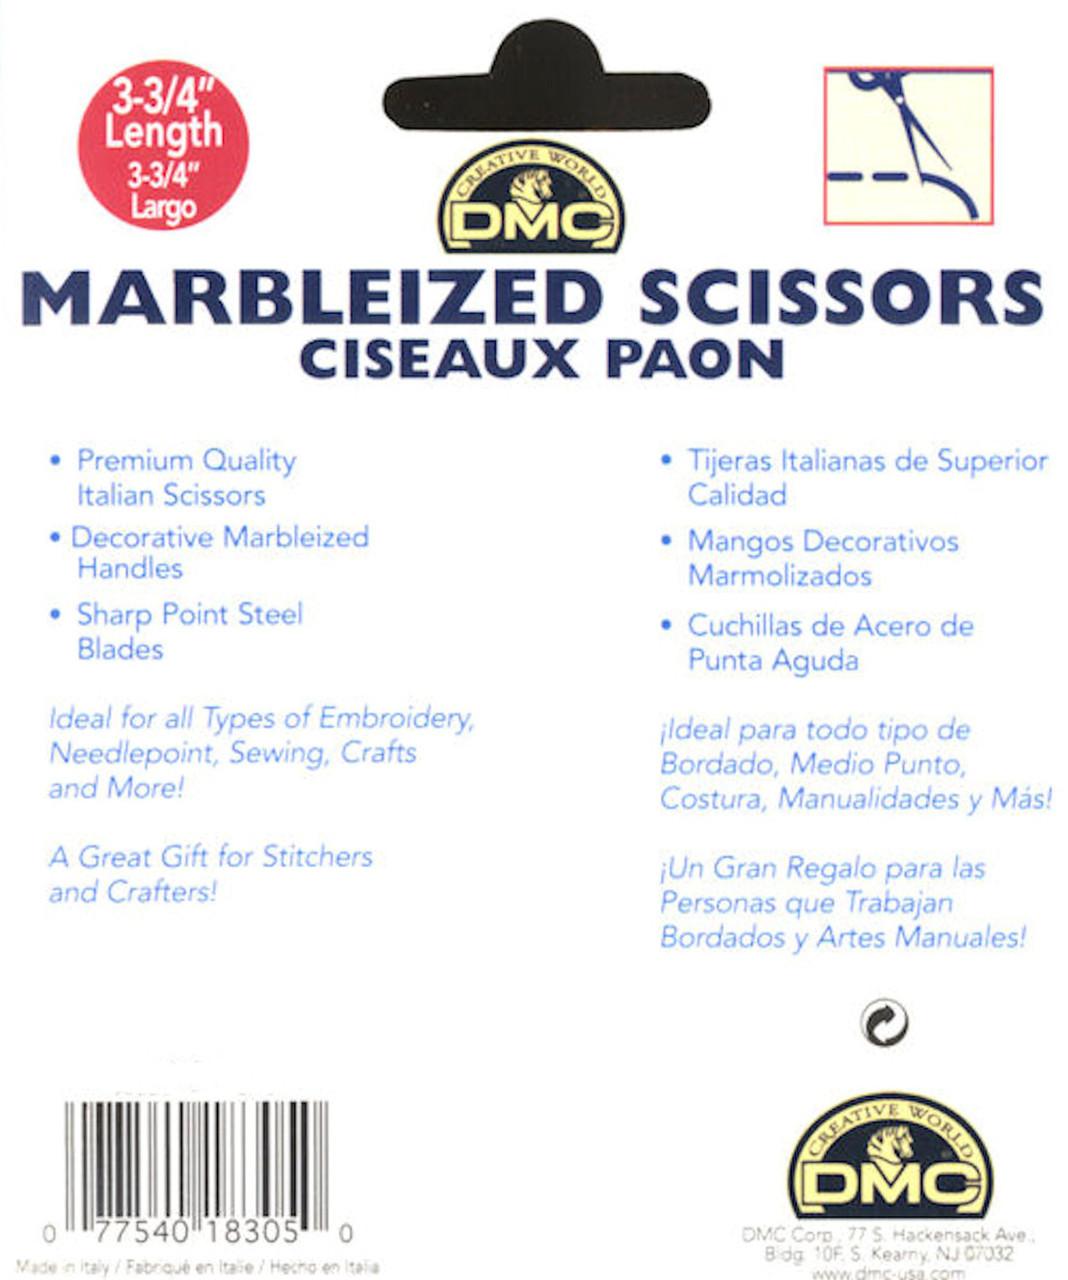 DMC - Golden Copper Marbleized Scissors